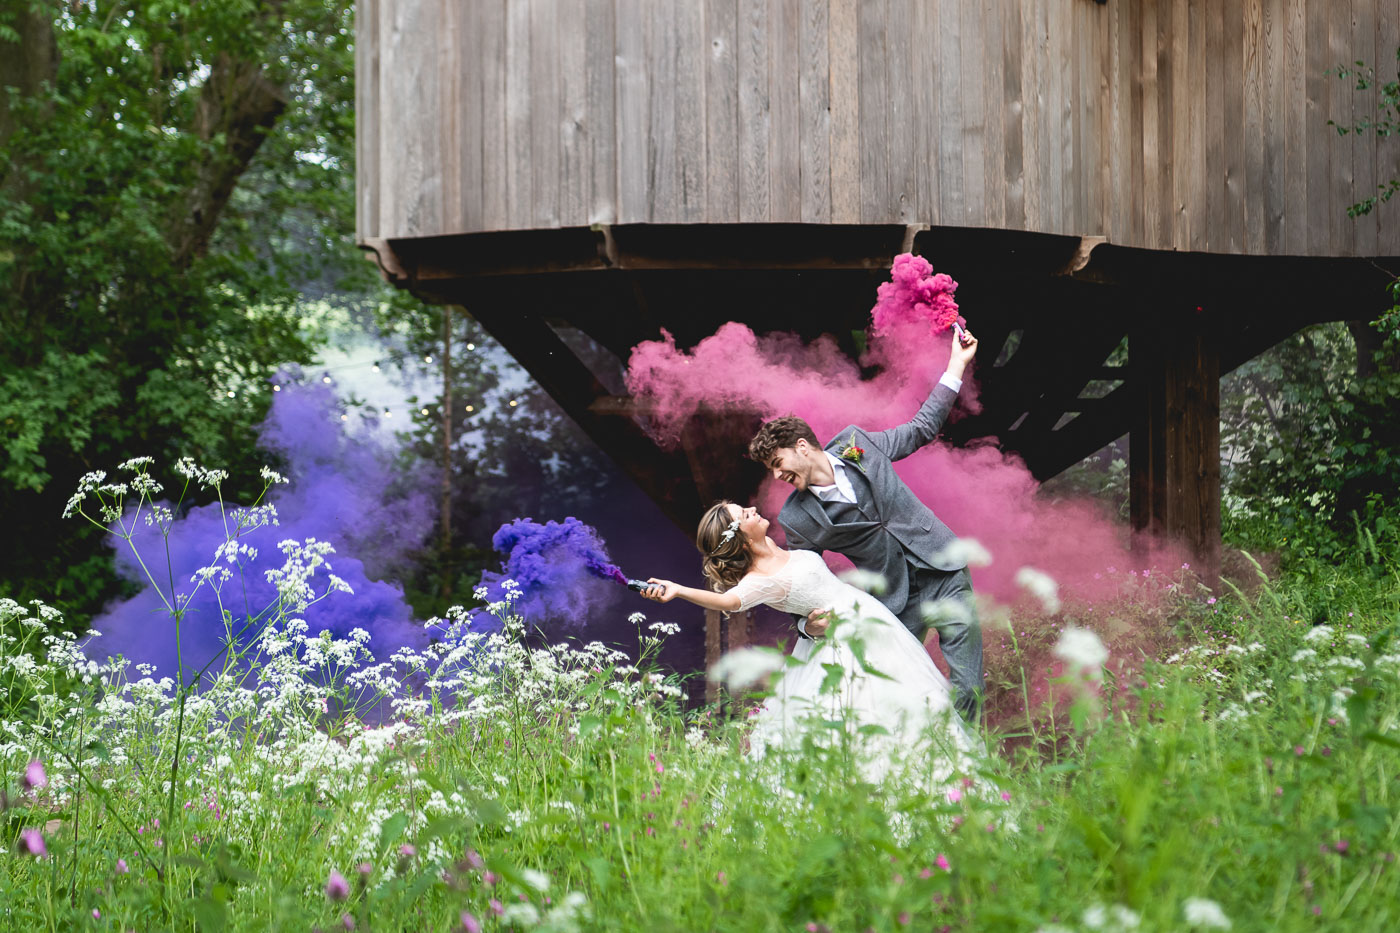 hothorpe-woodlands-wedding-300519-1010.jpg